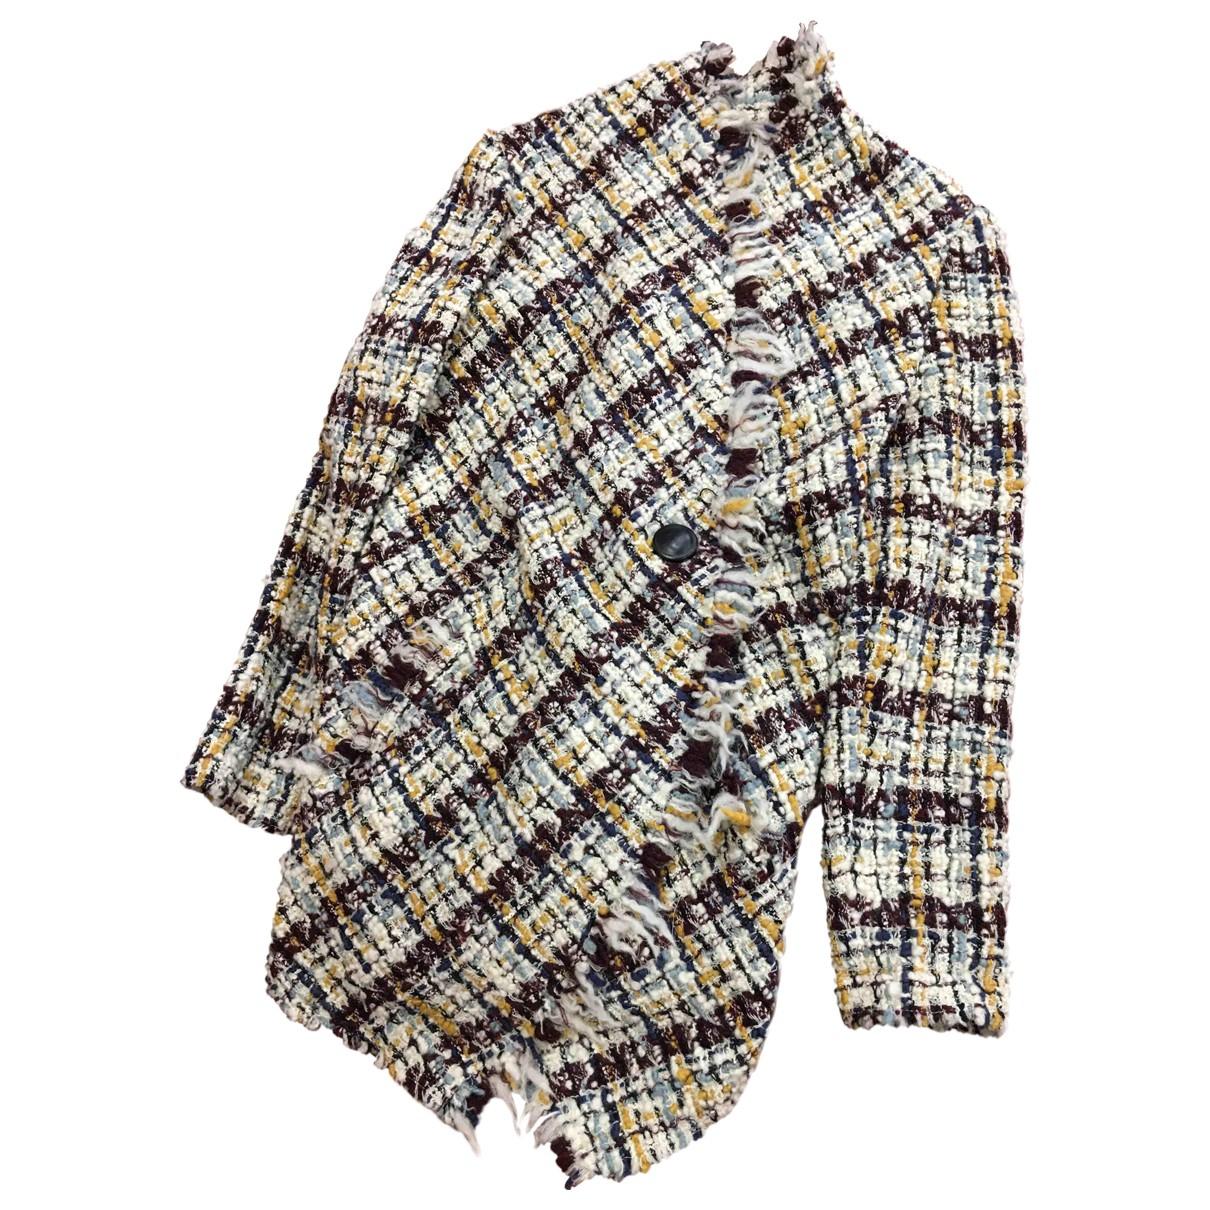 Isabel Marant N Multicolour Wool jacket for Women 36 FR